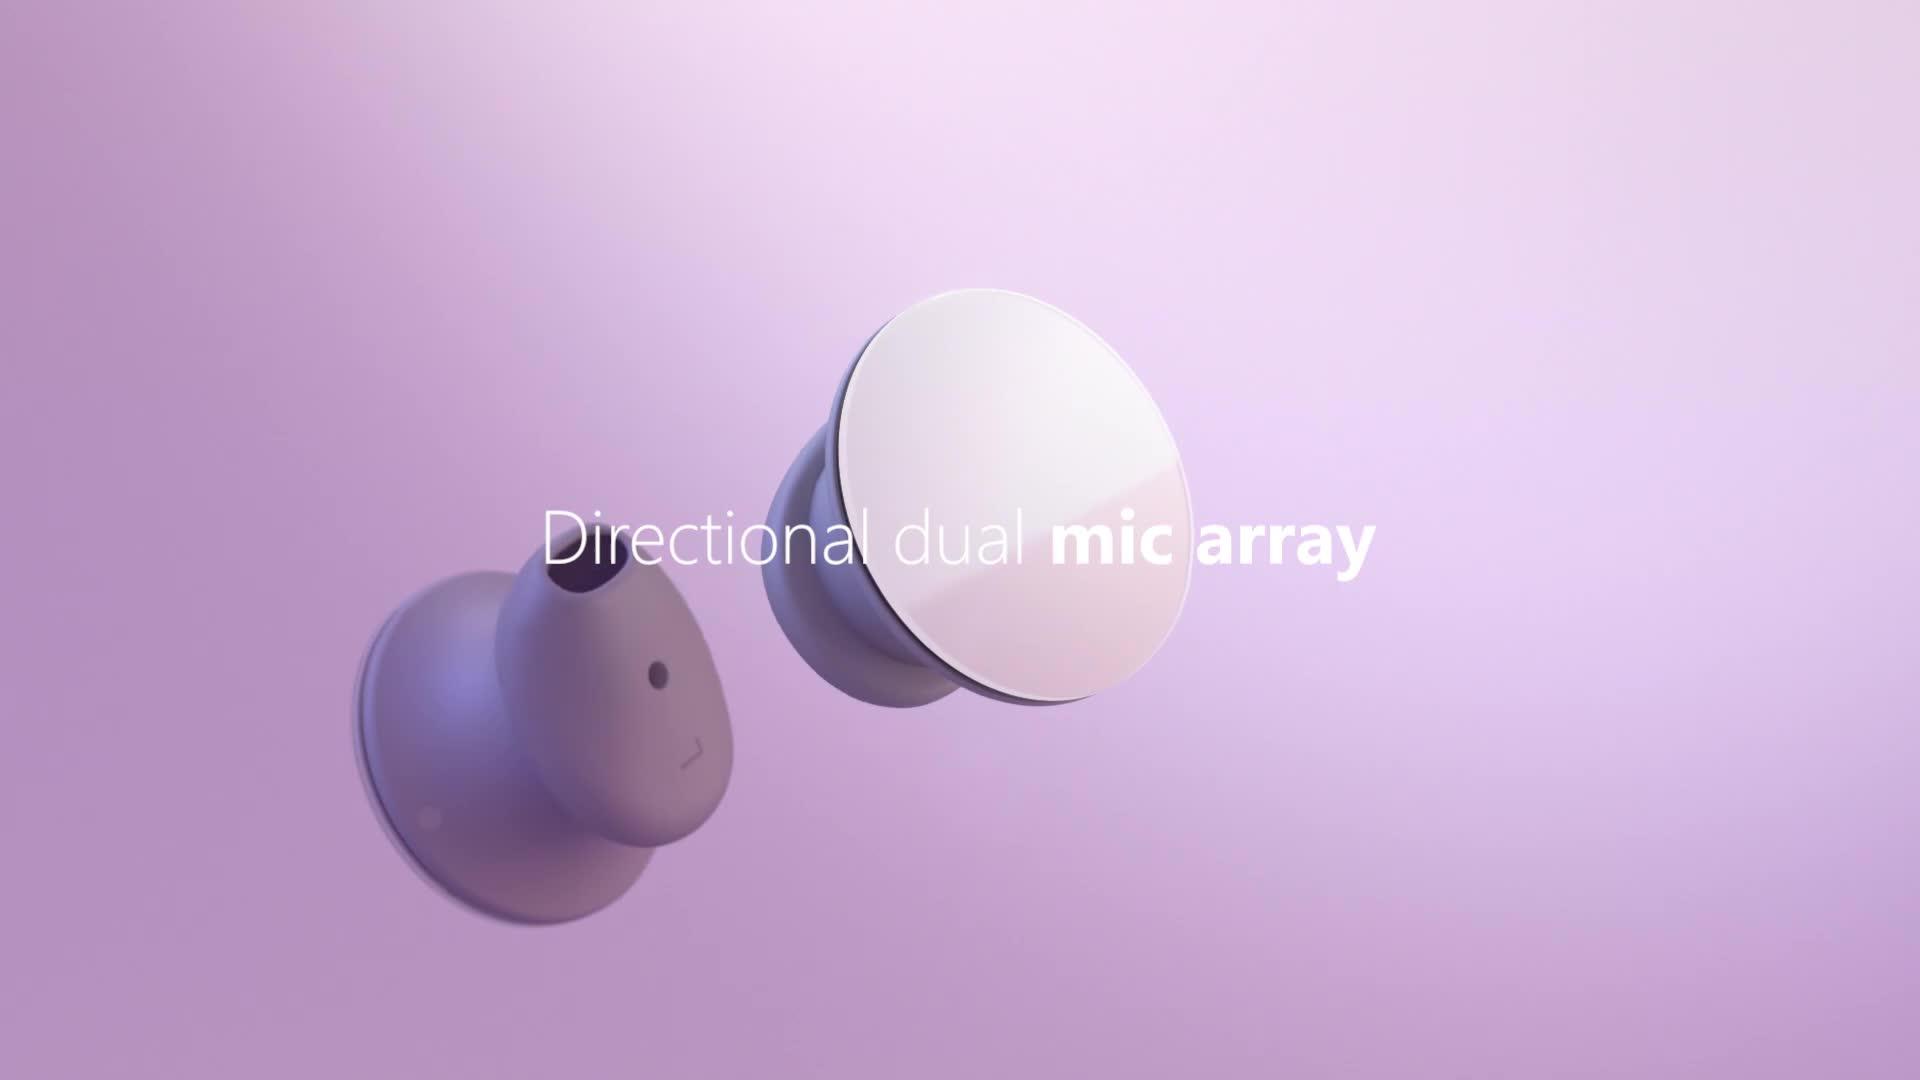 Microsoft, Surface, Microsoft Surface, Kopfhörer, Bluetooth, Earbuds, Surface earBuds, Surface Earbuds 2